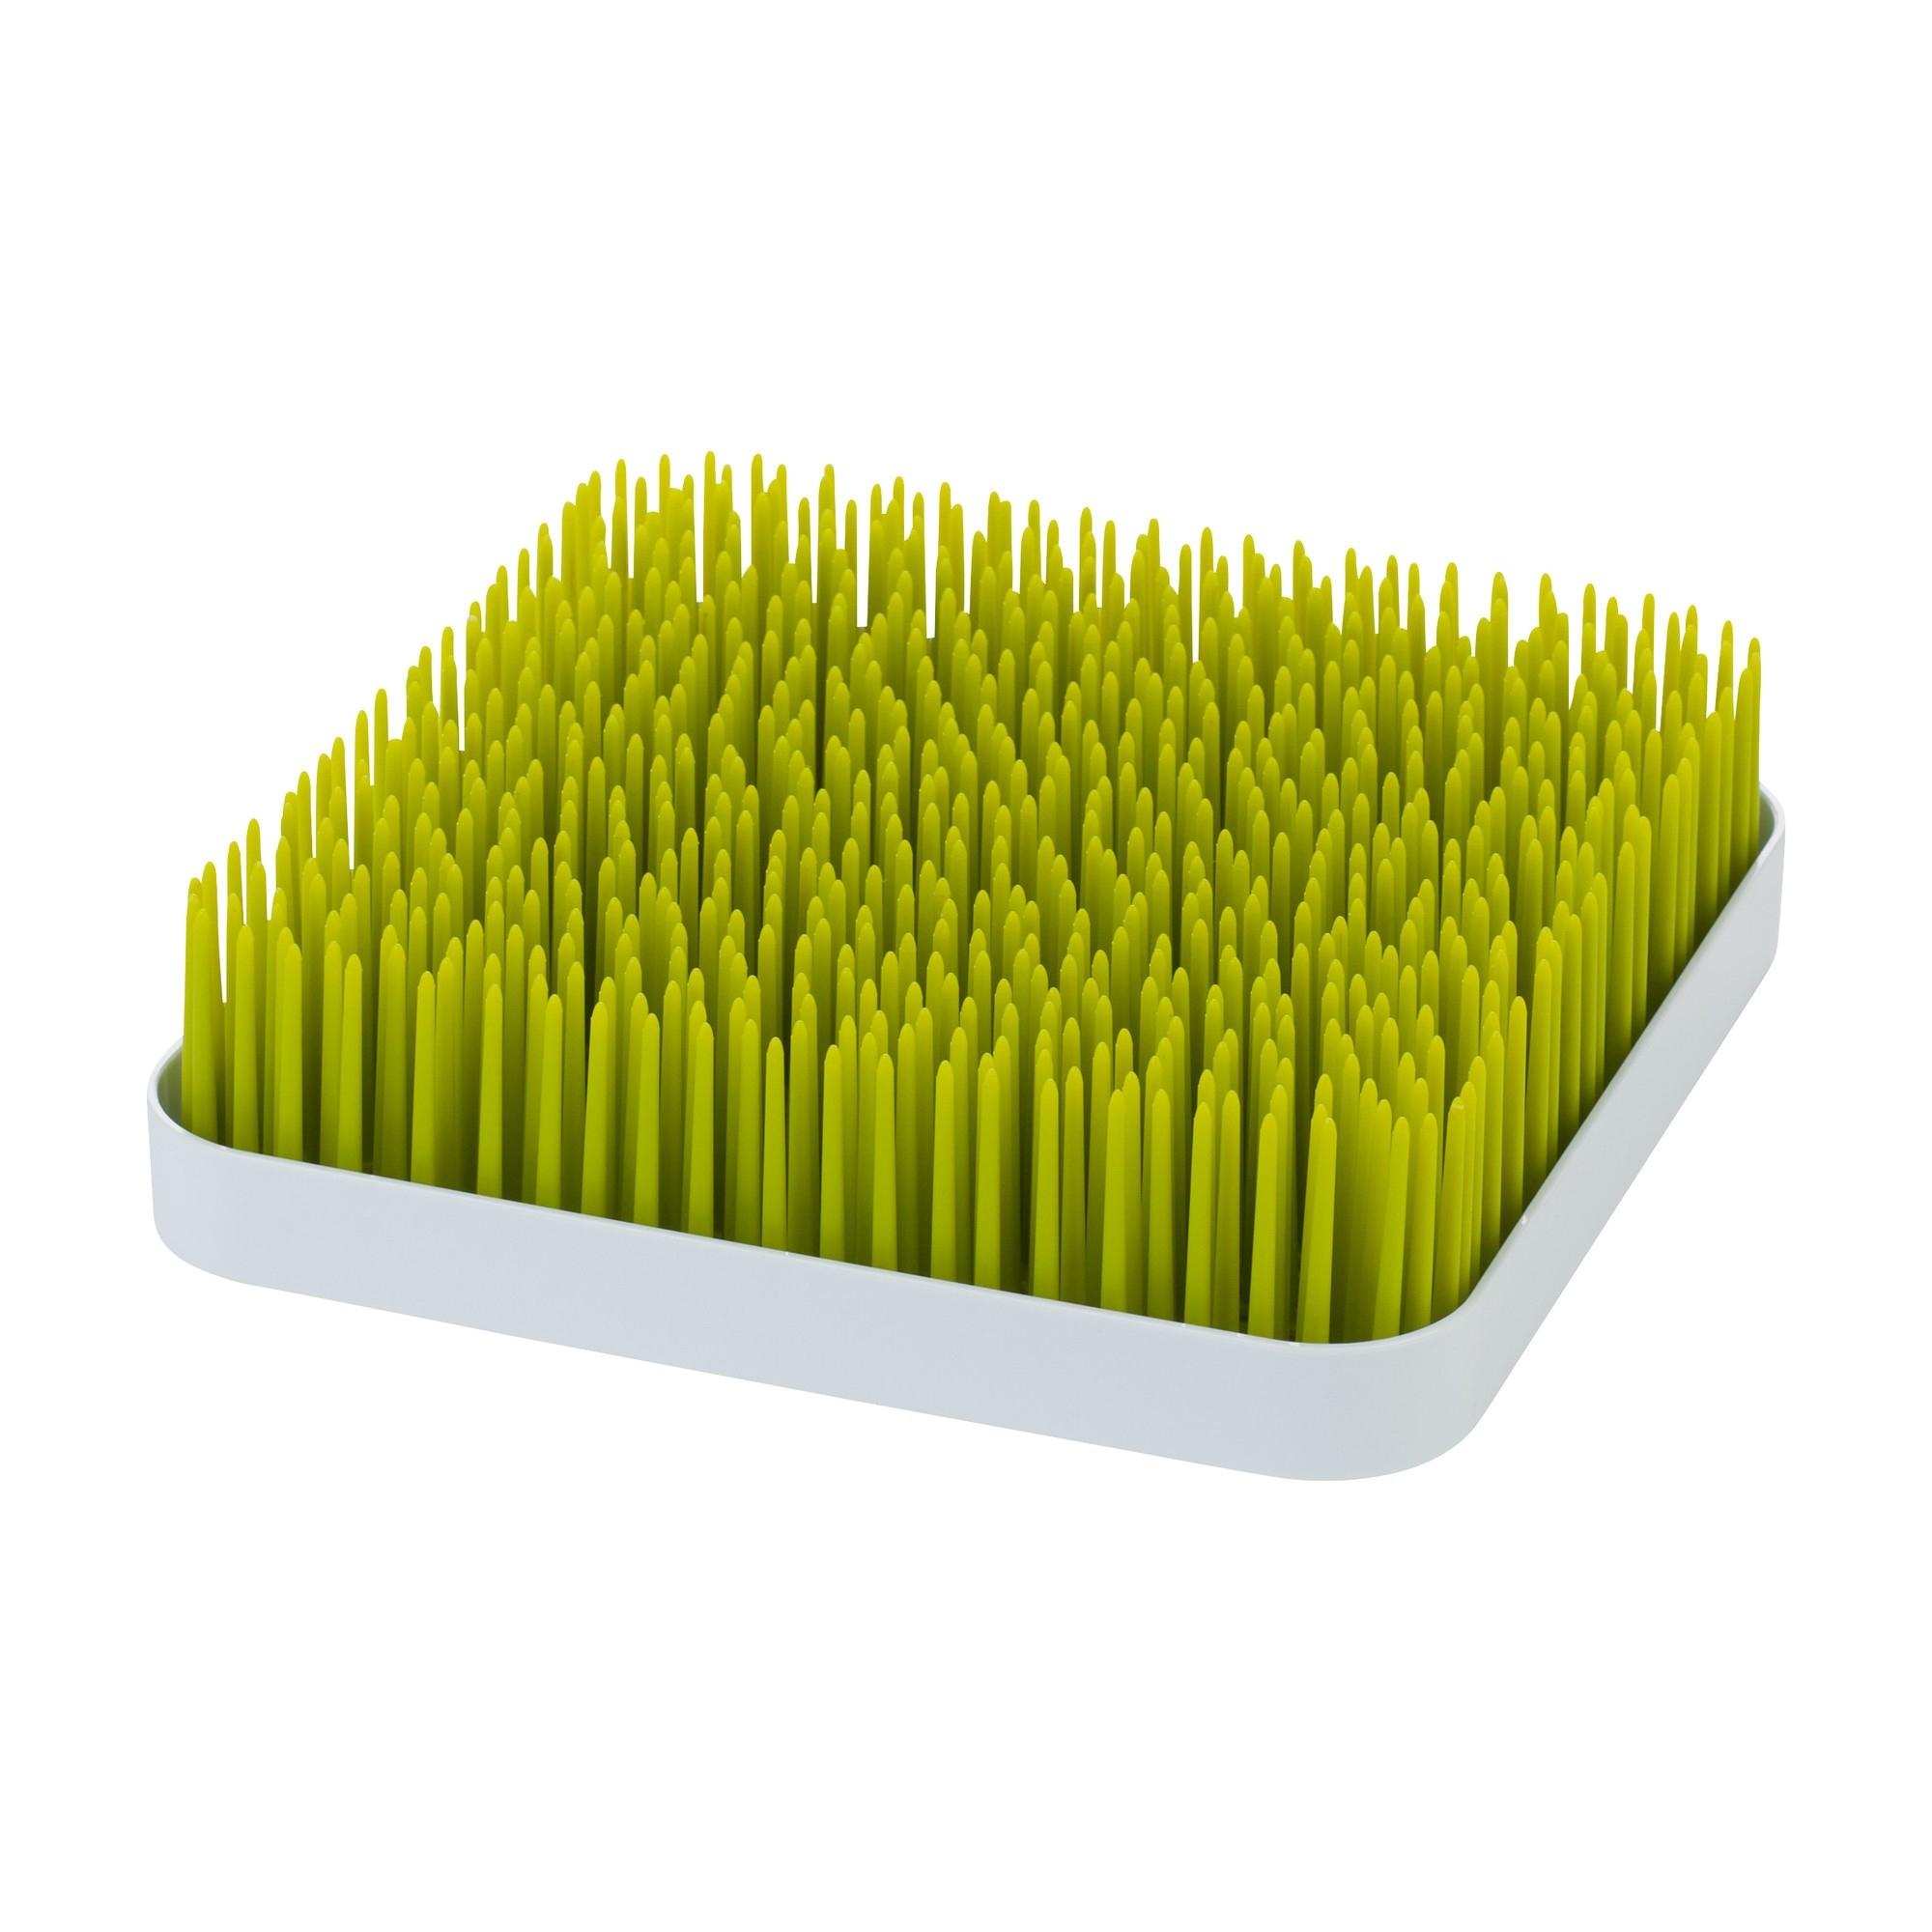 Suszarka do naczyń Grass Green Boon